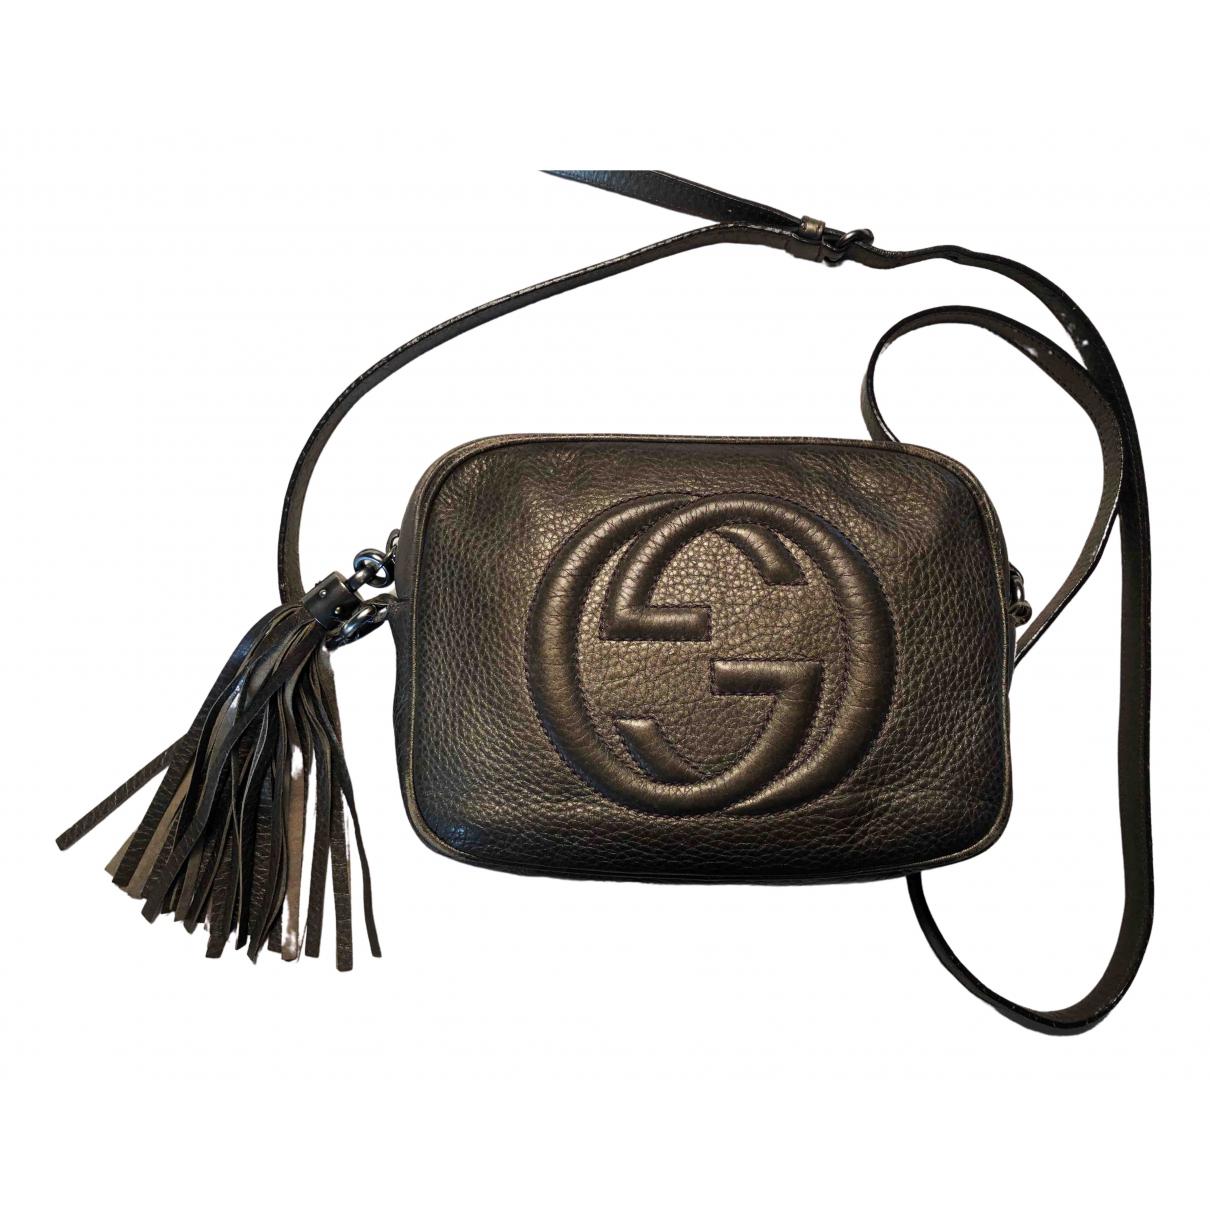 Gucci - Sac a main Soho pour femme en cuir - gris